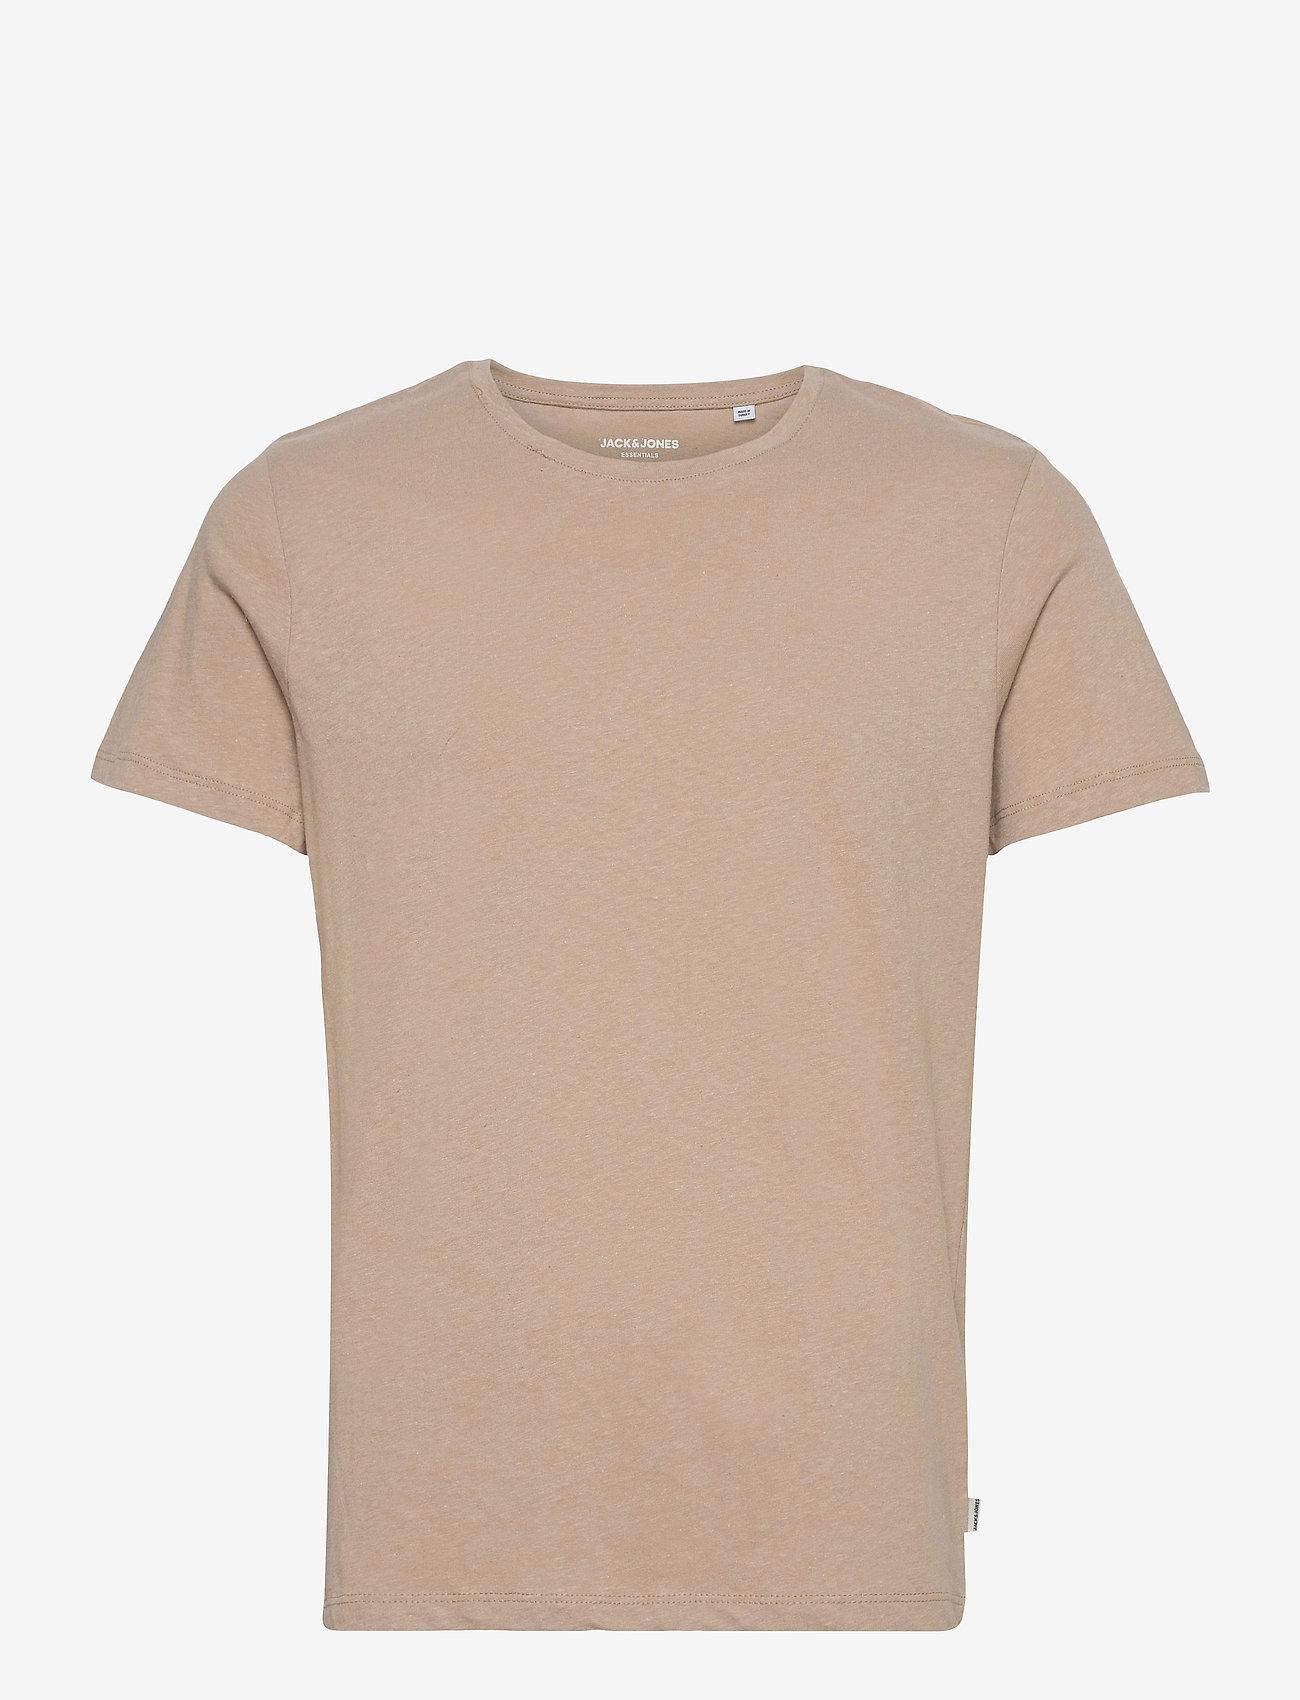 Jack & Jones - JJELINEN BASIC TEE SS CREW NECK STS - basic t-shirts - crockery - 0